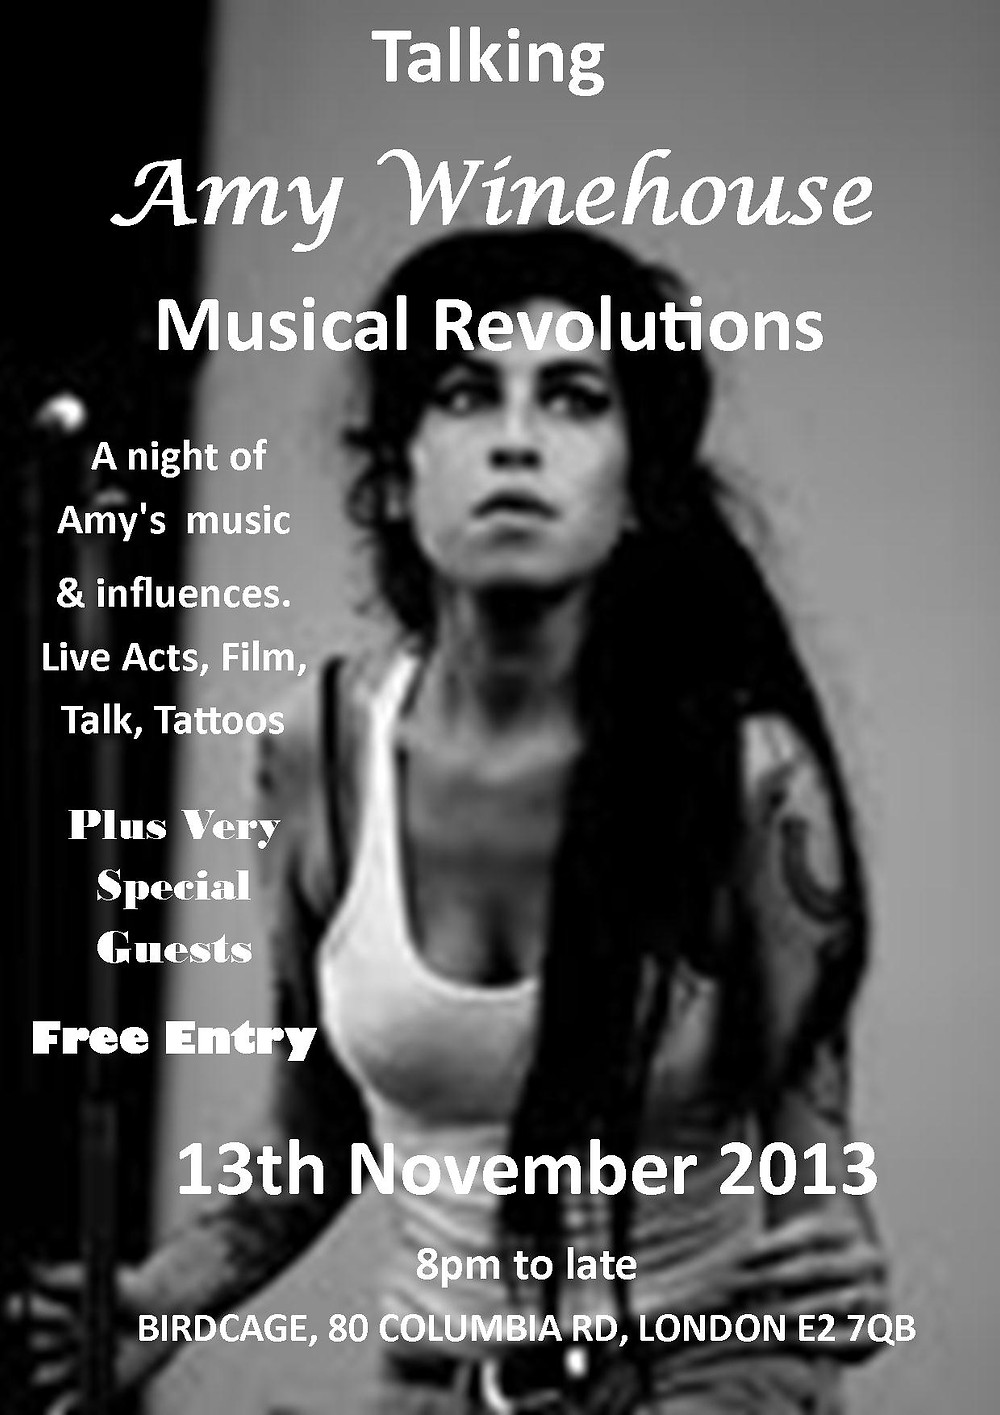 amy poster 13.11.13.jpg